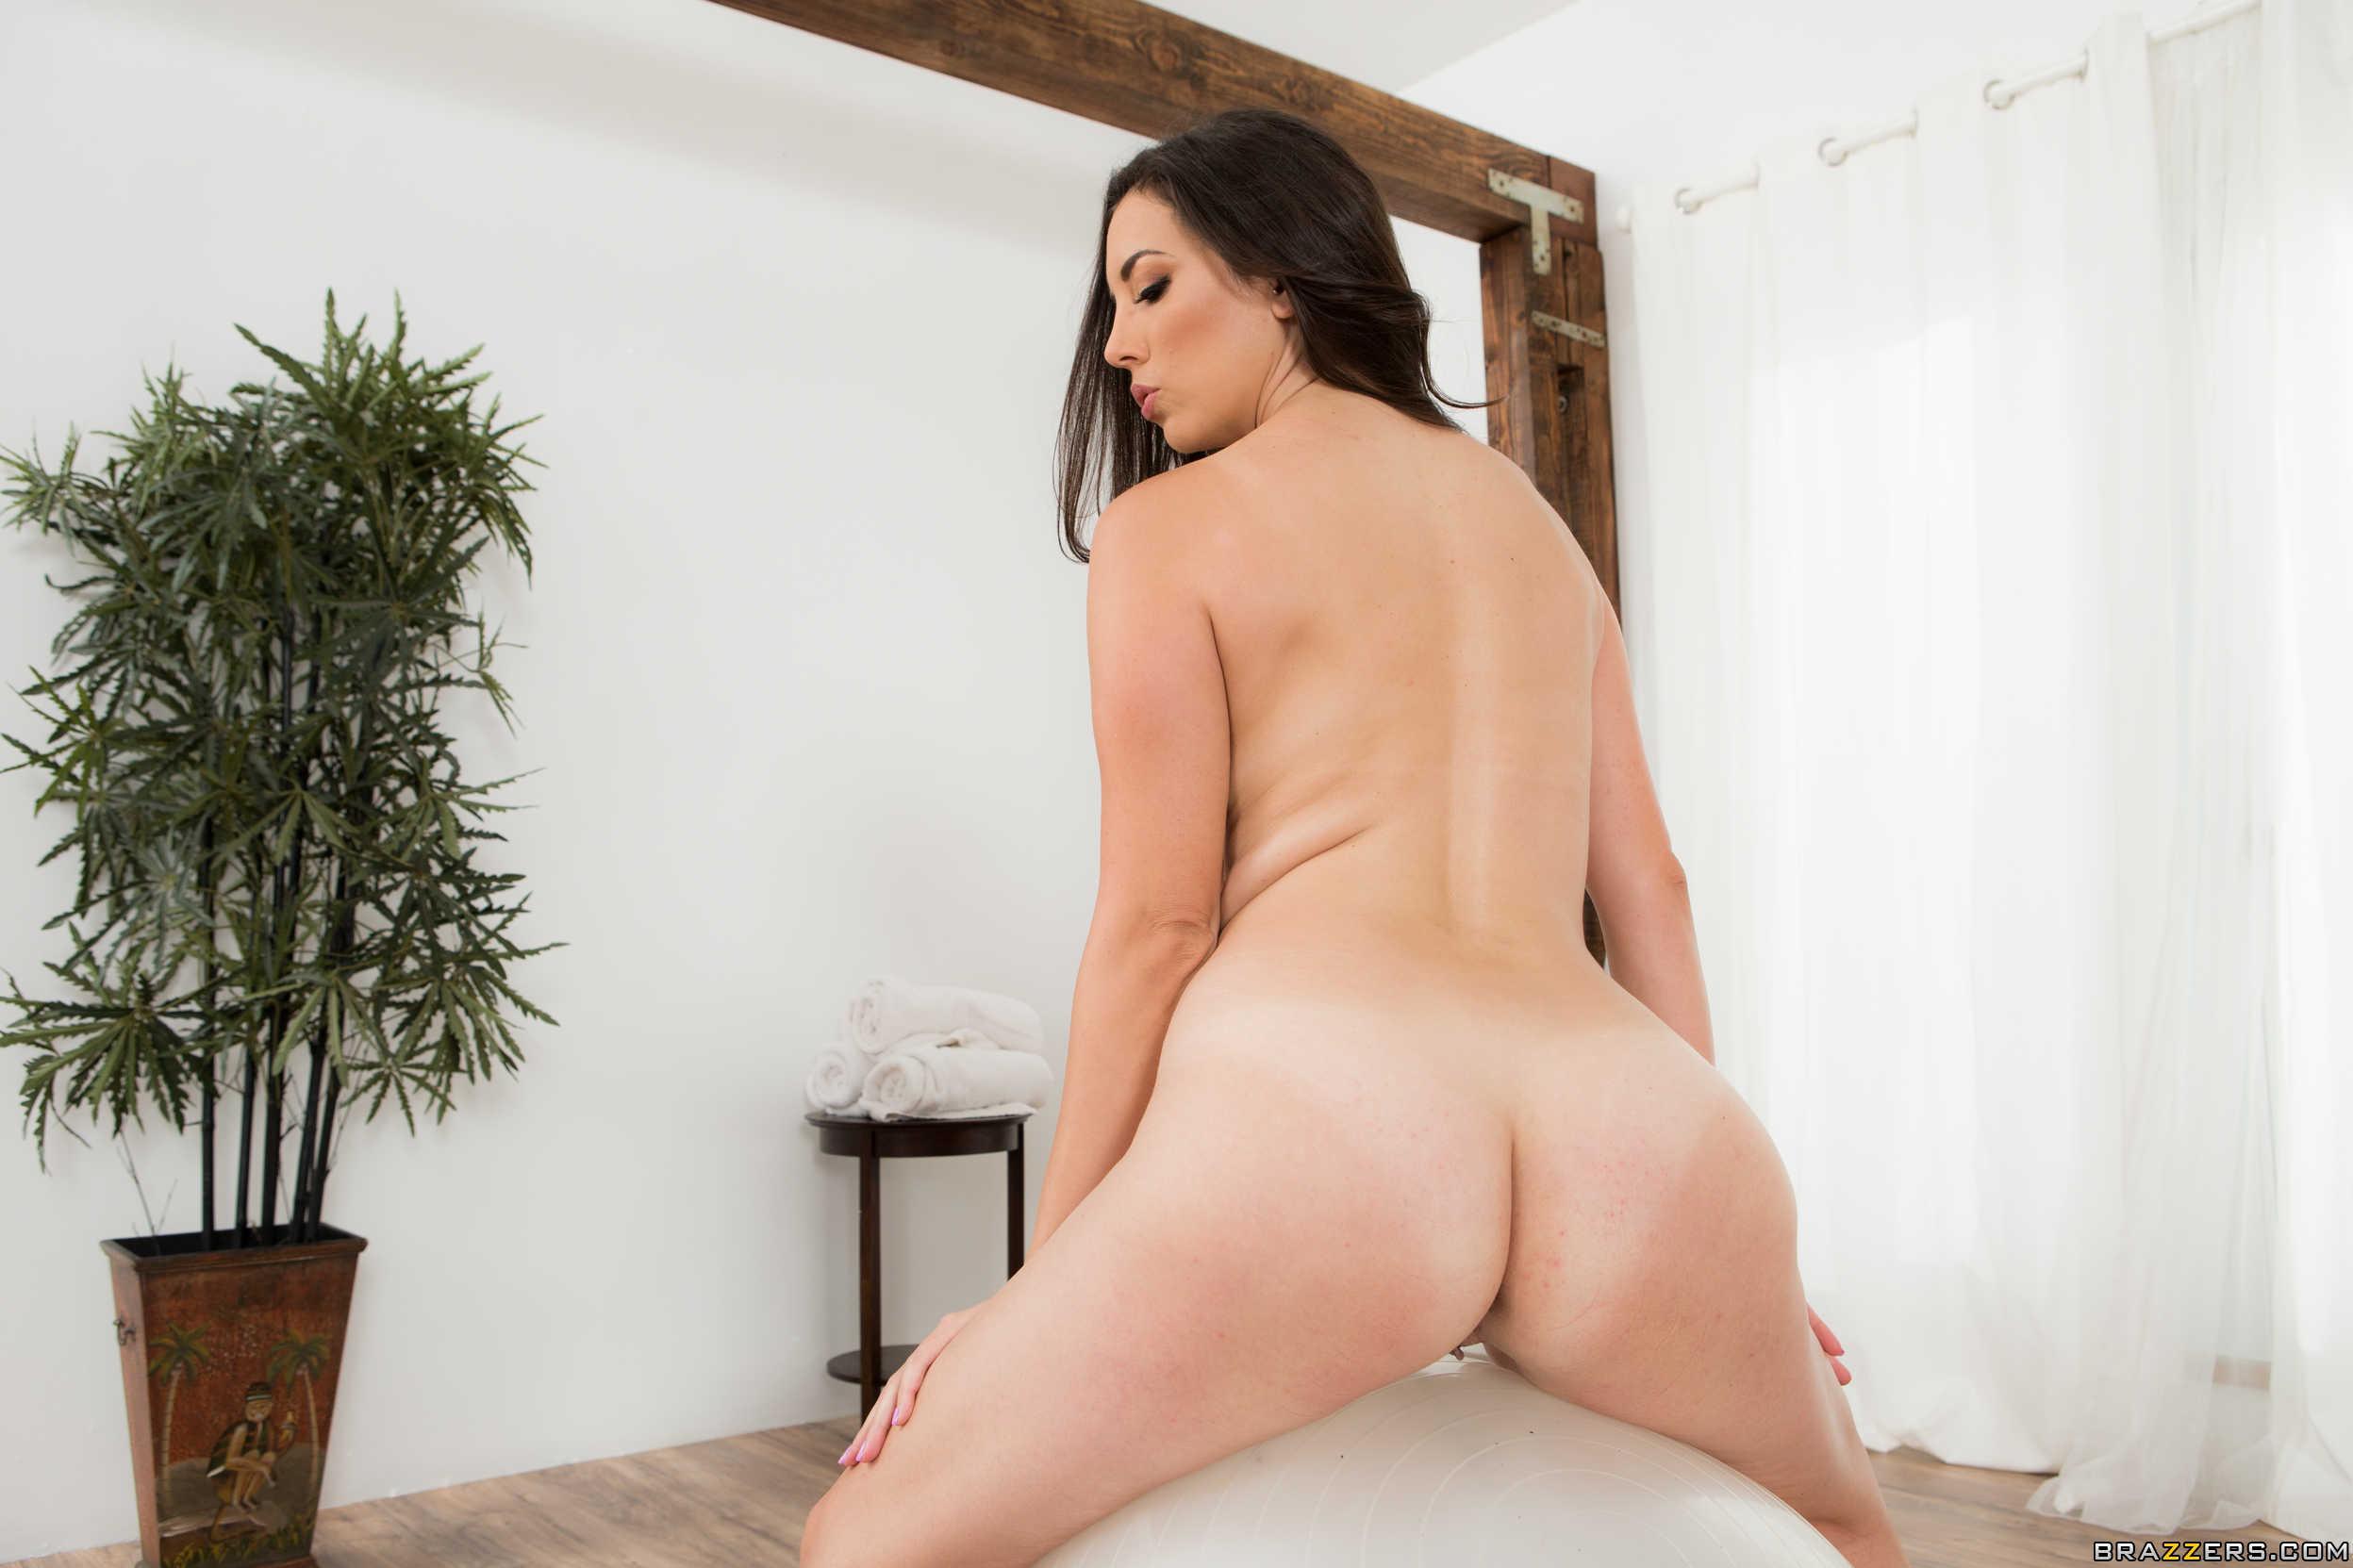 Jelena Jensen muestra su conchita espectacular